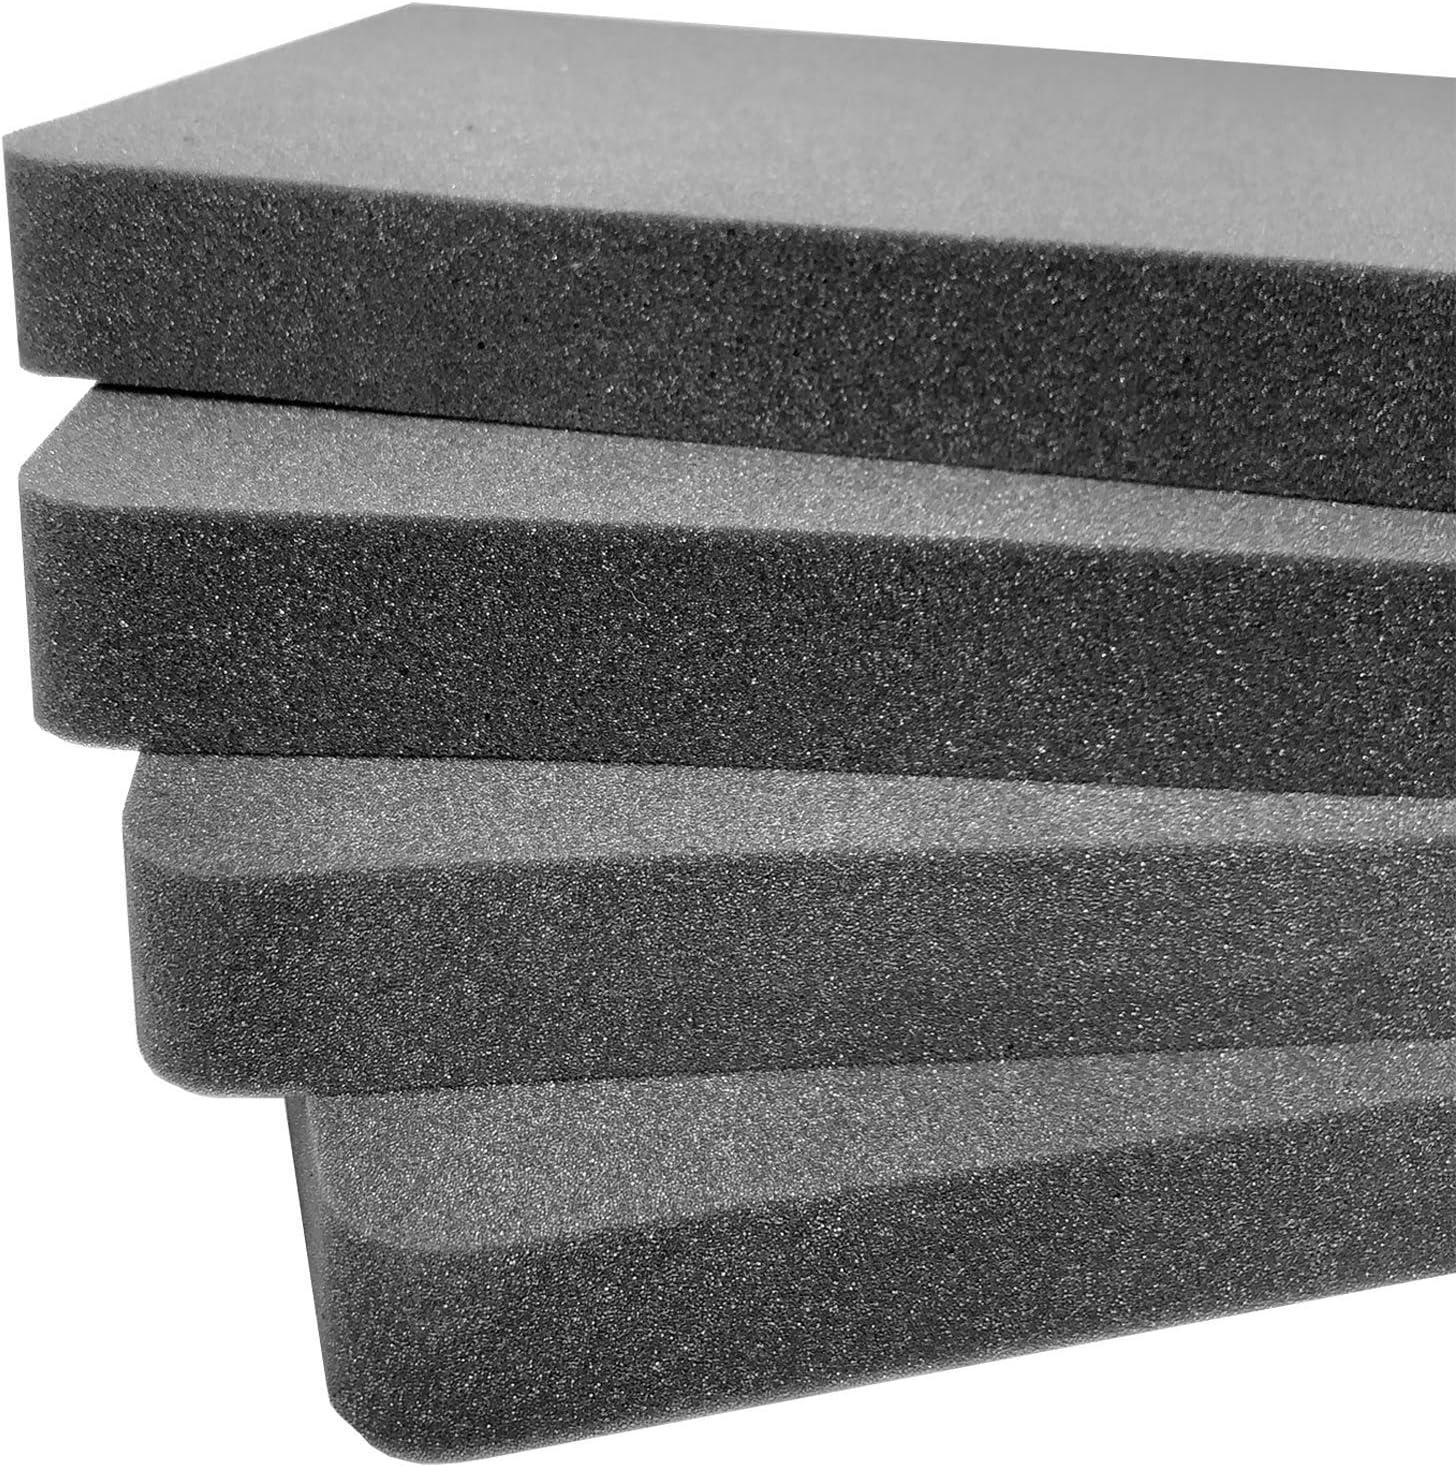 2 Pieces Pelican Case Vault V770 Replacement Foam Inserts Set